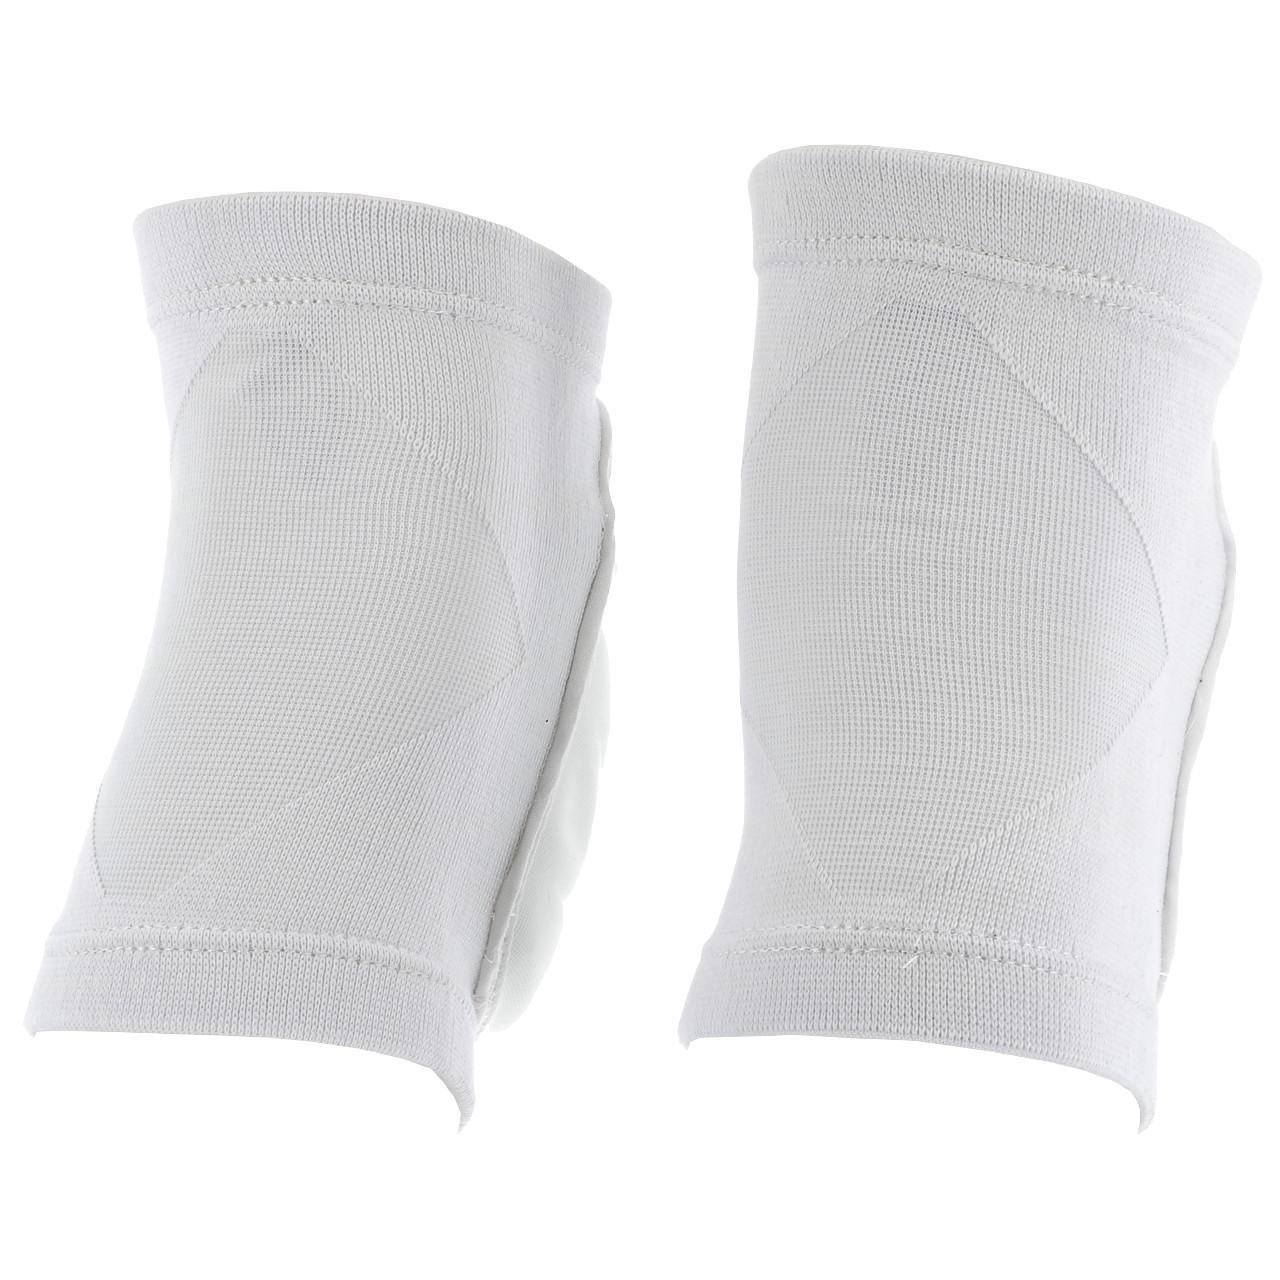 Knee-Pad-Set-Protection-Asics-Performance-White-Kneepad-White-15977-New thumbnail 4